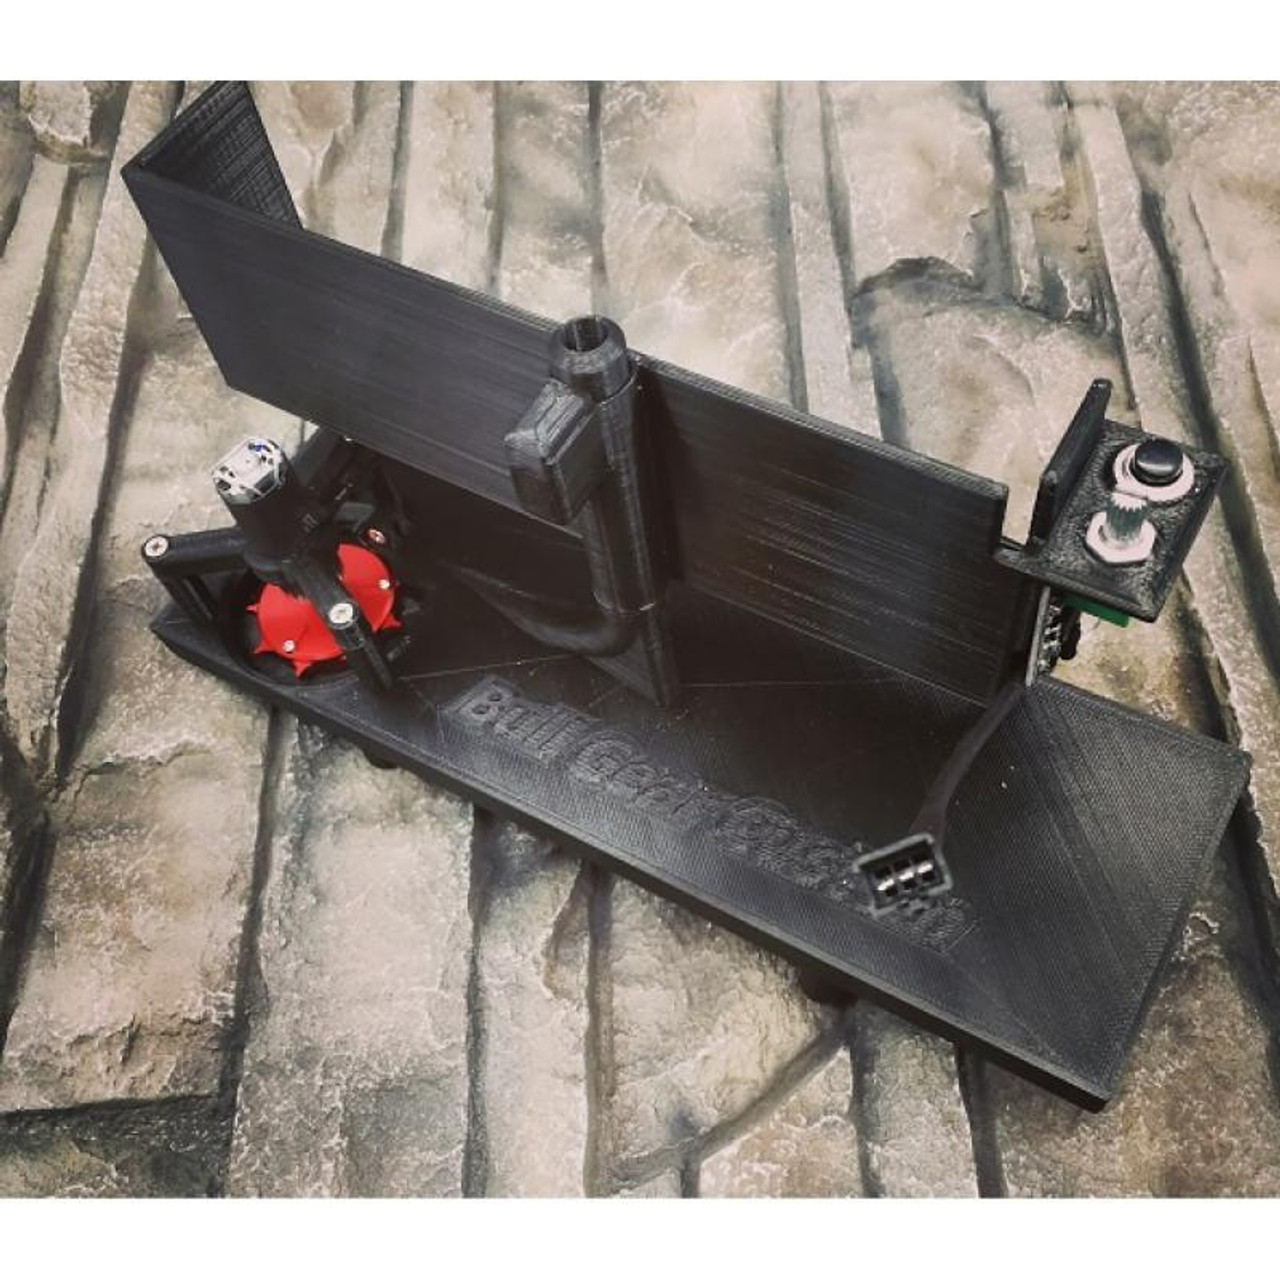 Bullgear Insert for PKM Box Magazine -- A&K models